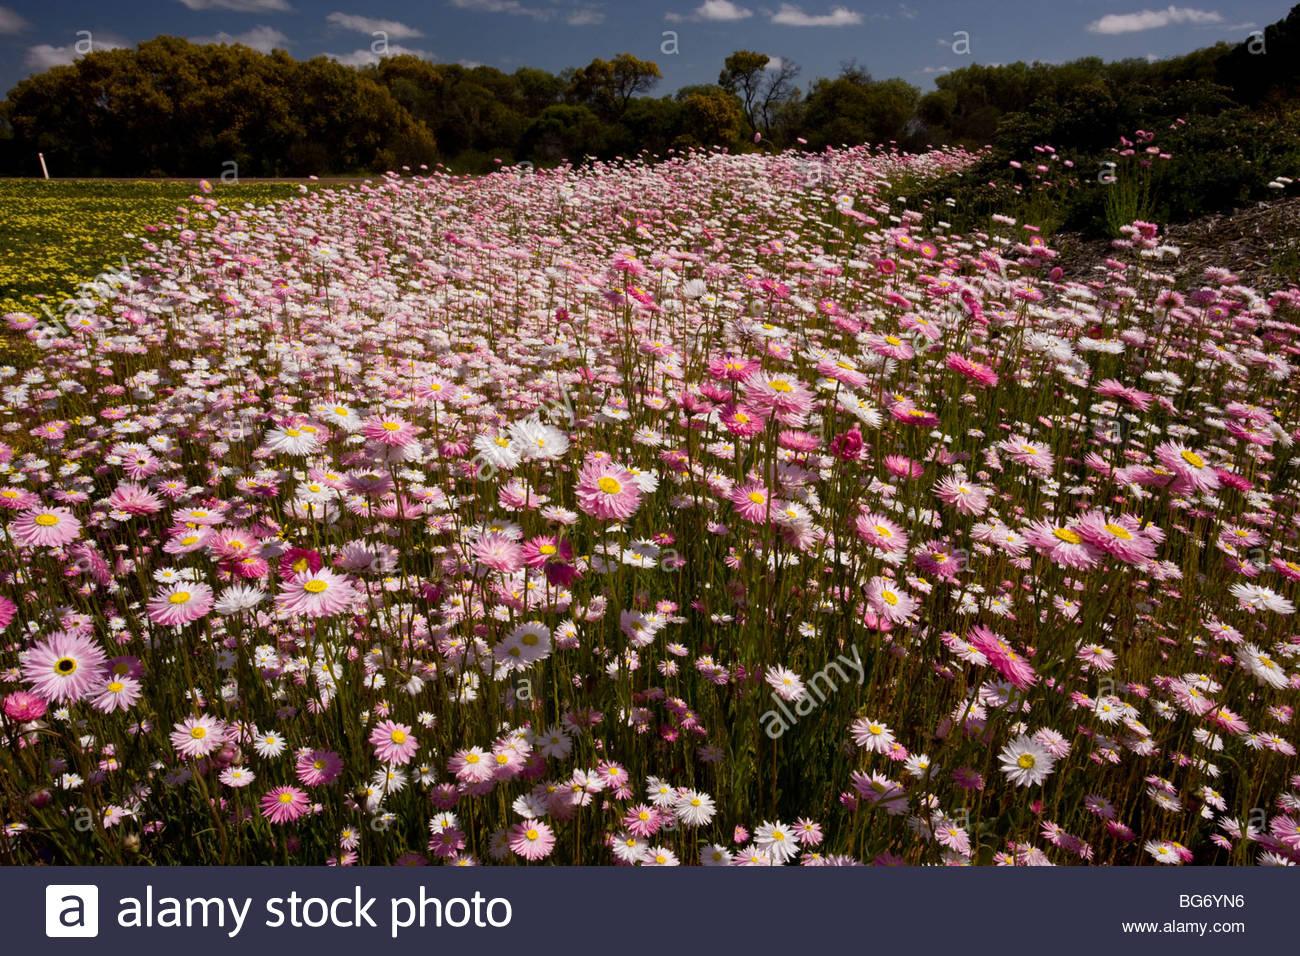 Rosy Sunray Or Pink And White Everlasting, Rhodanthe Chlorocephala.